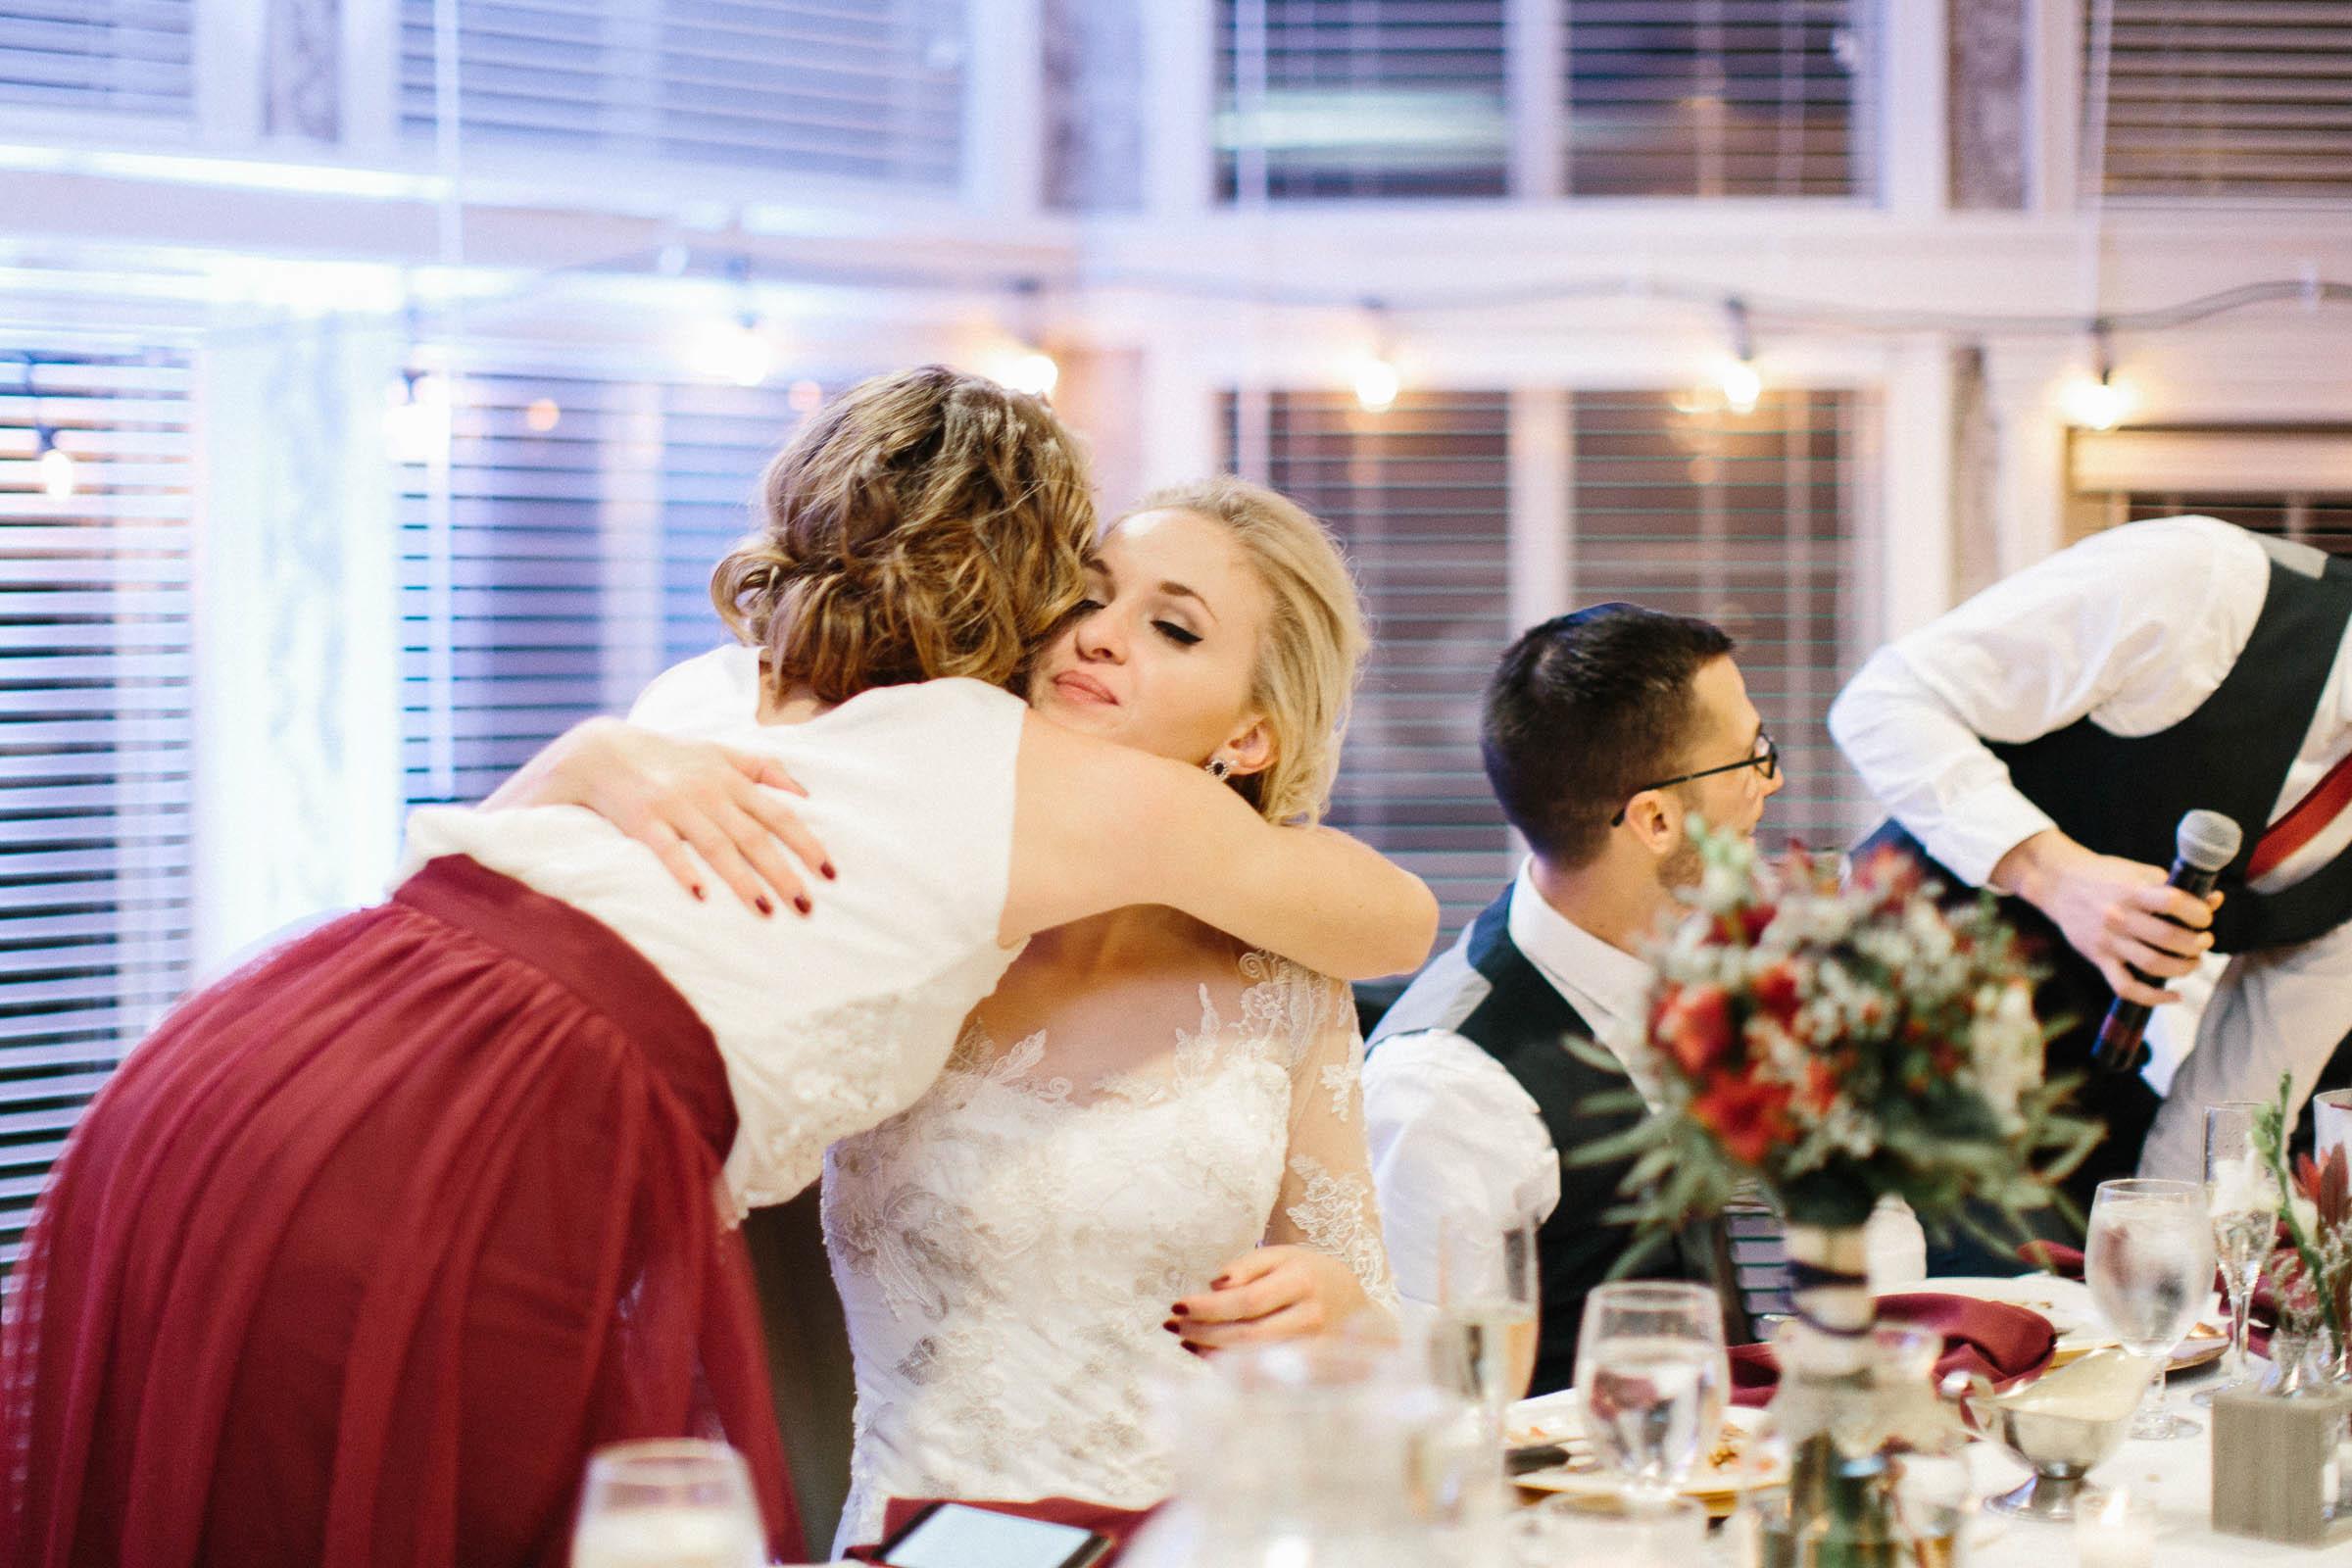 Jenna&Austin_SiouxFalls_Wedding_Photographer_099.jpg